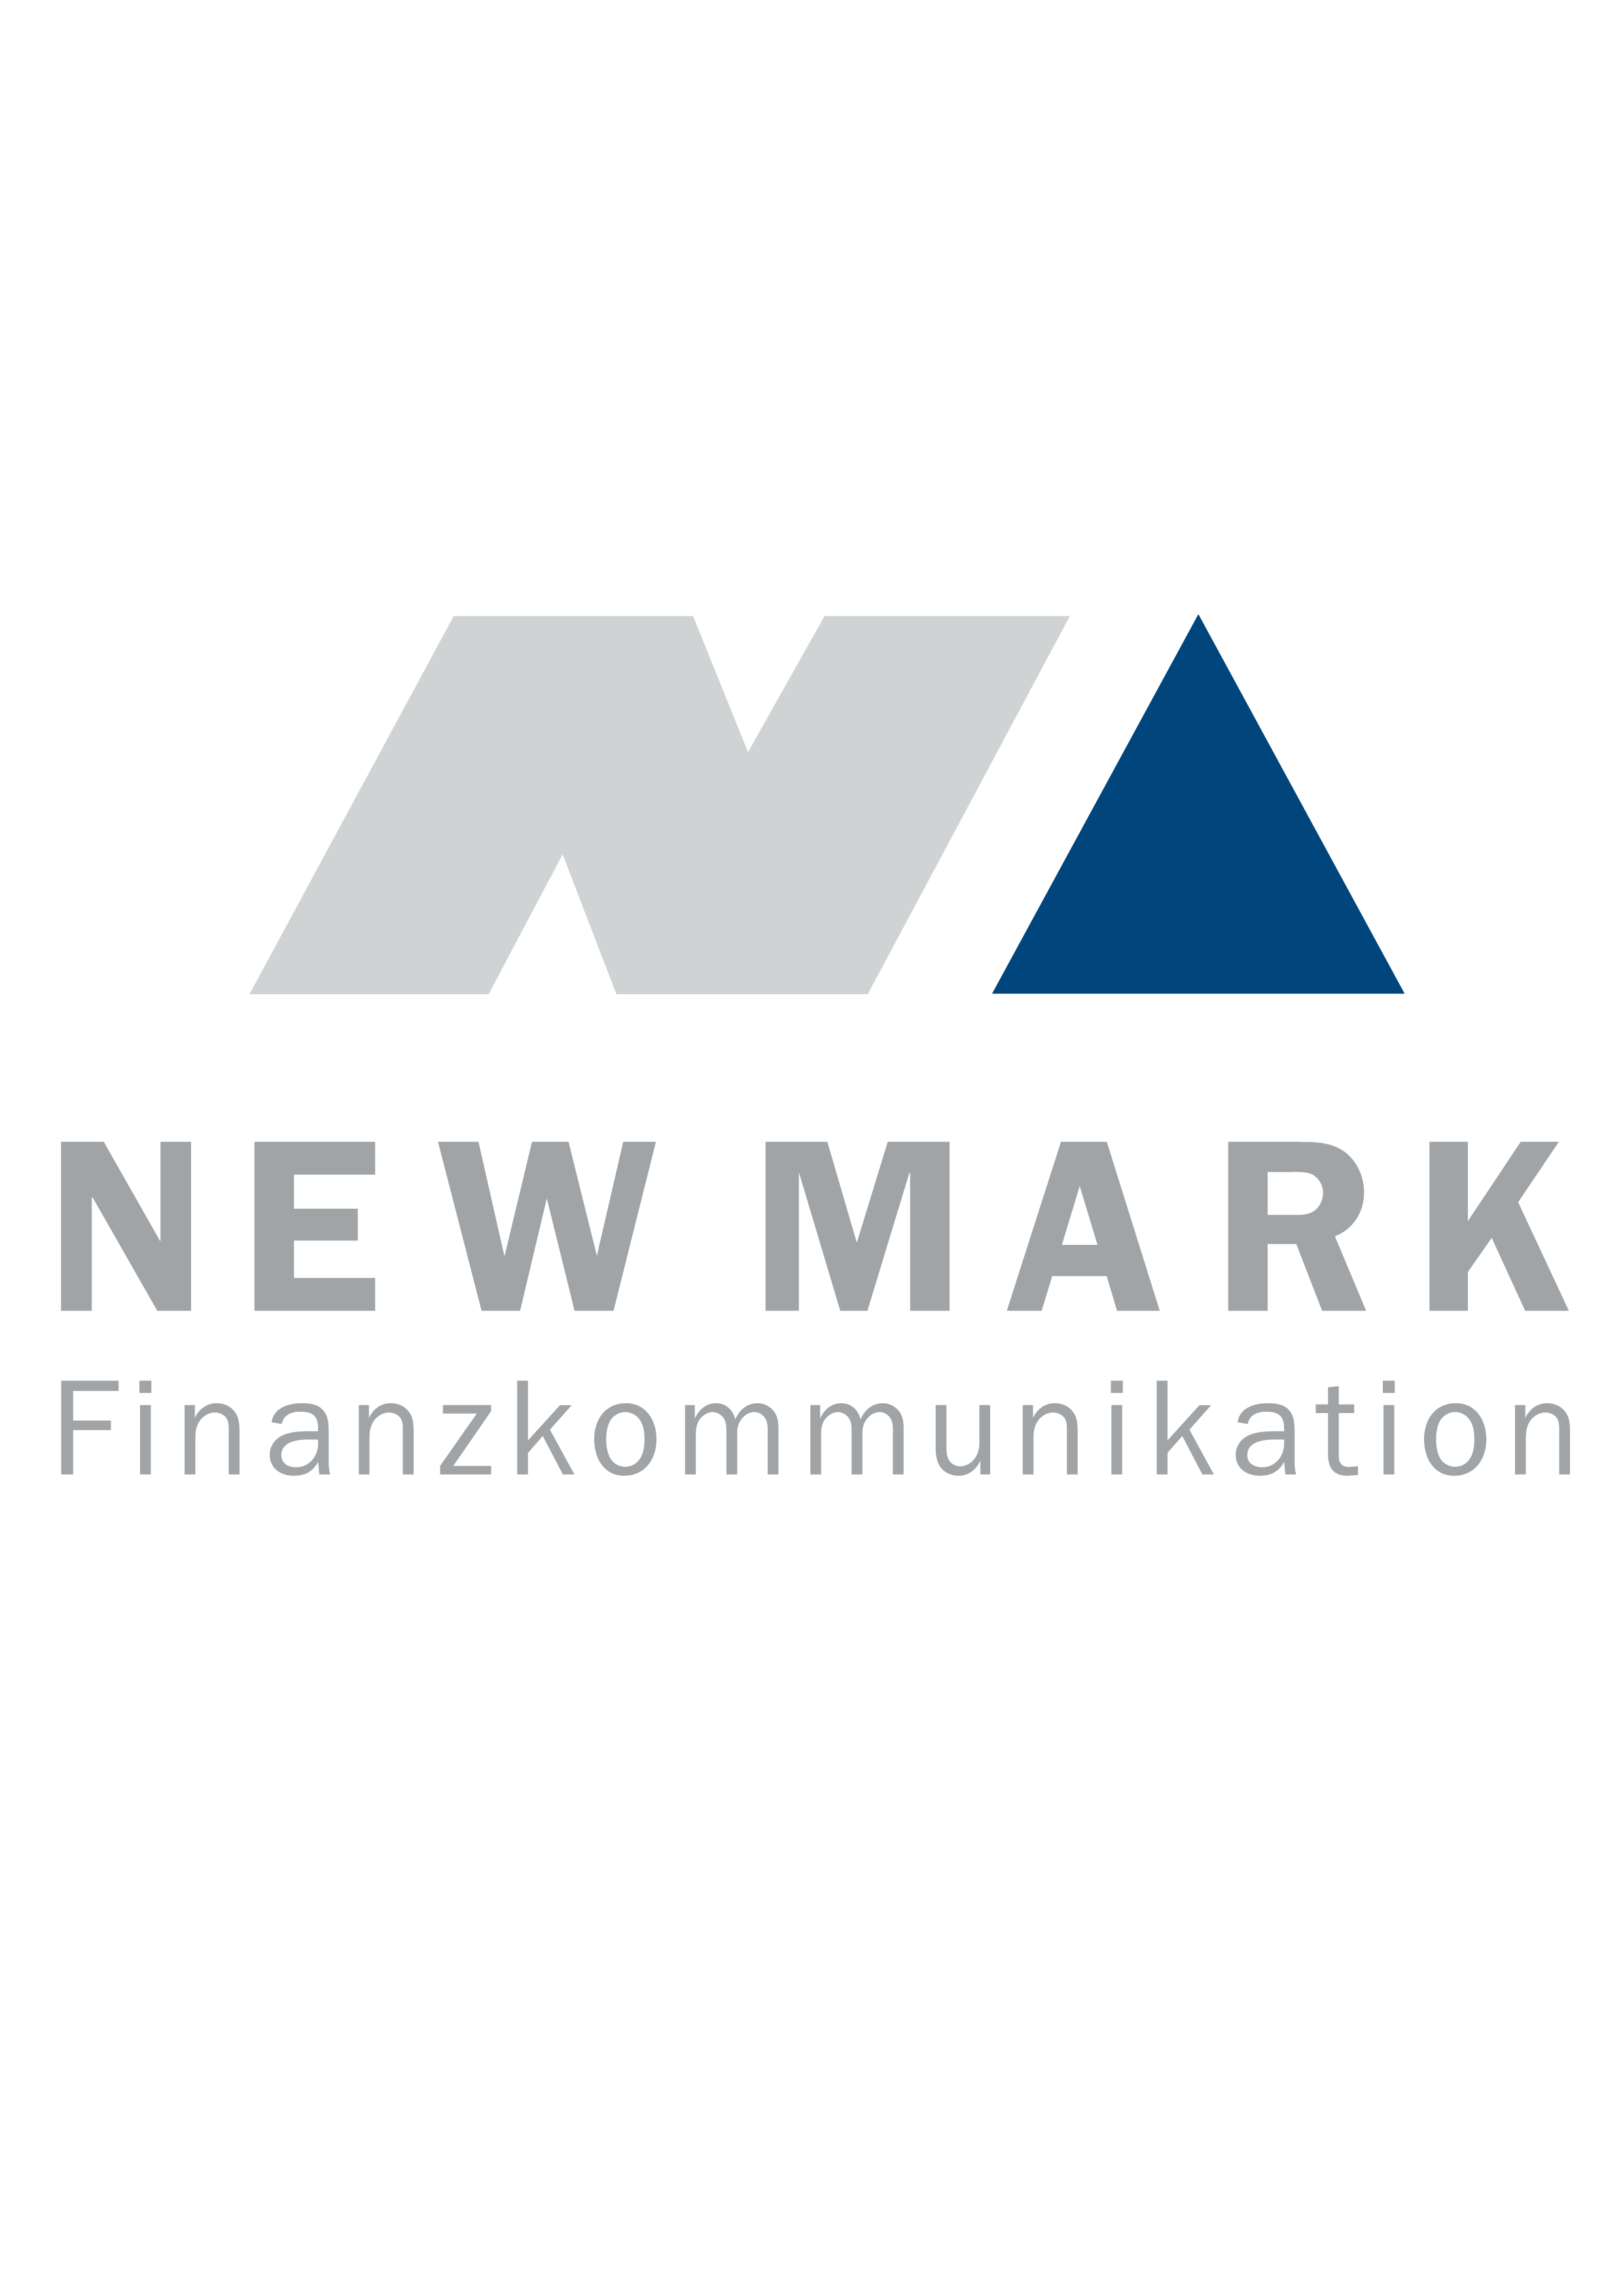 LogoNewMark-01